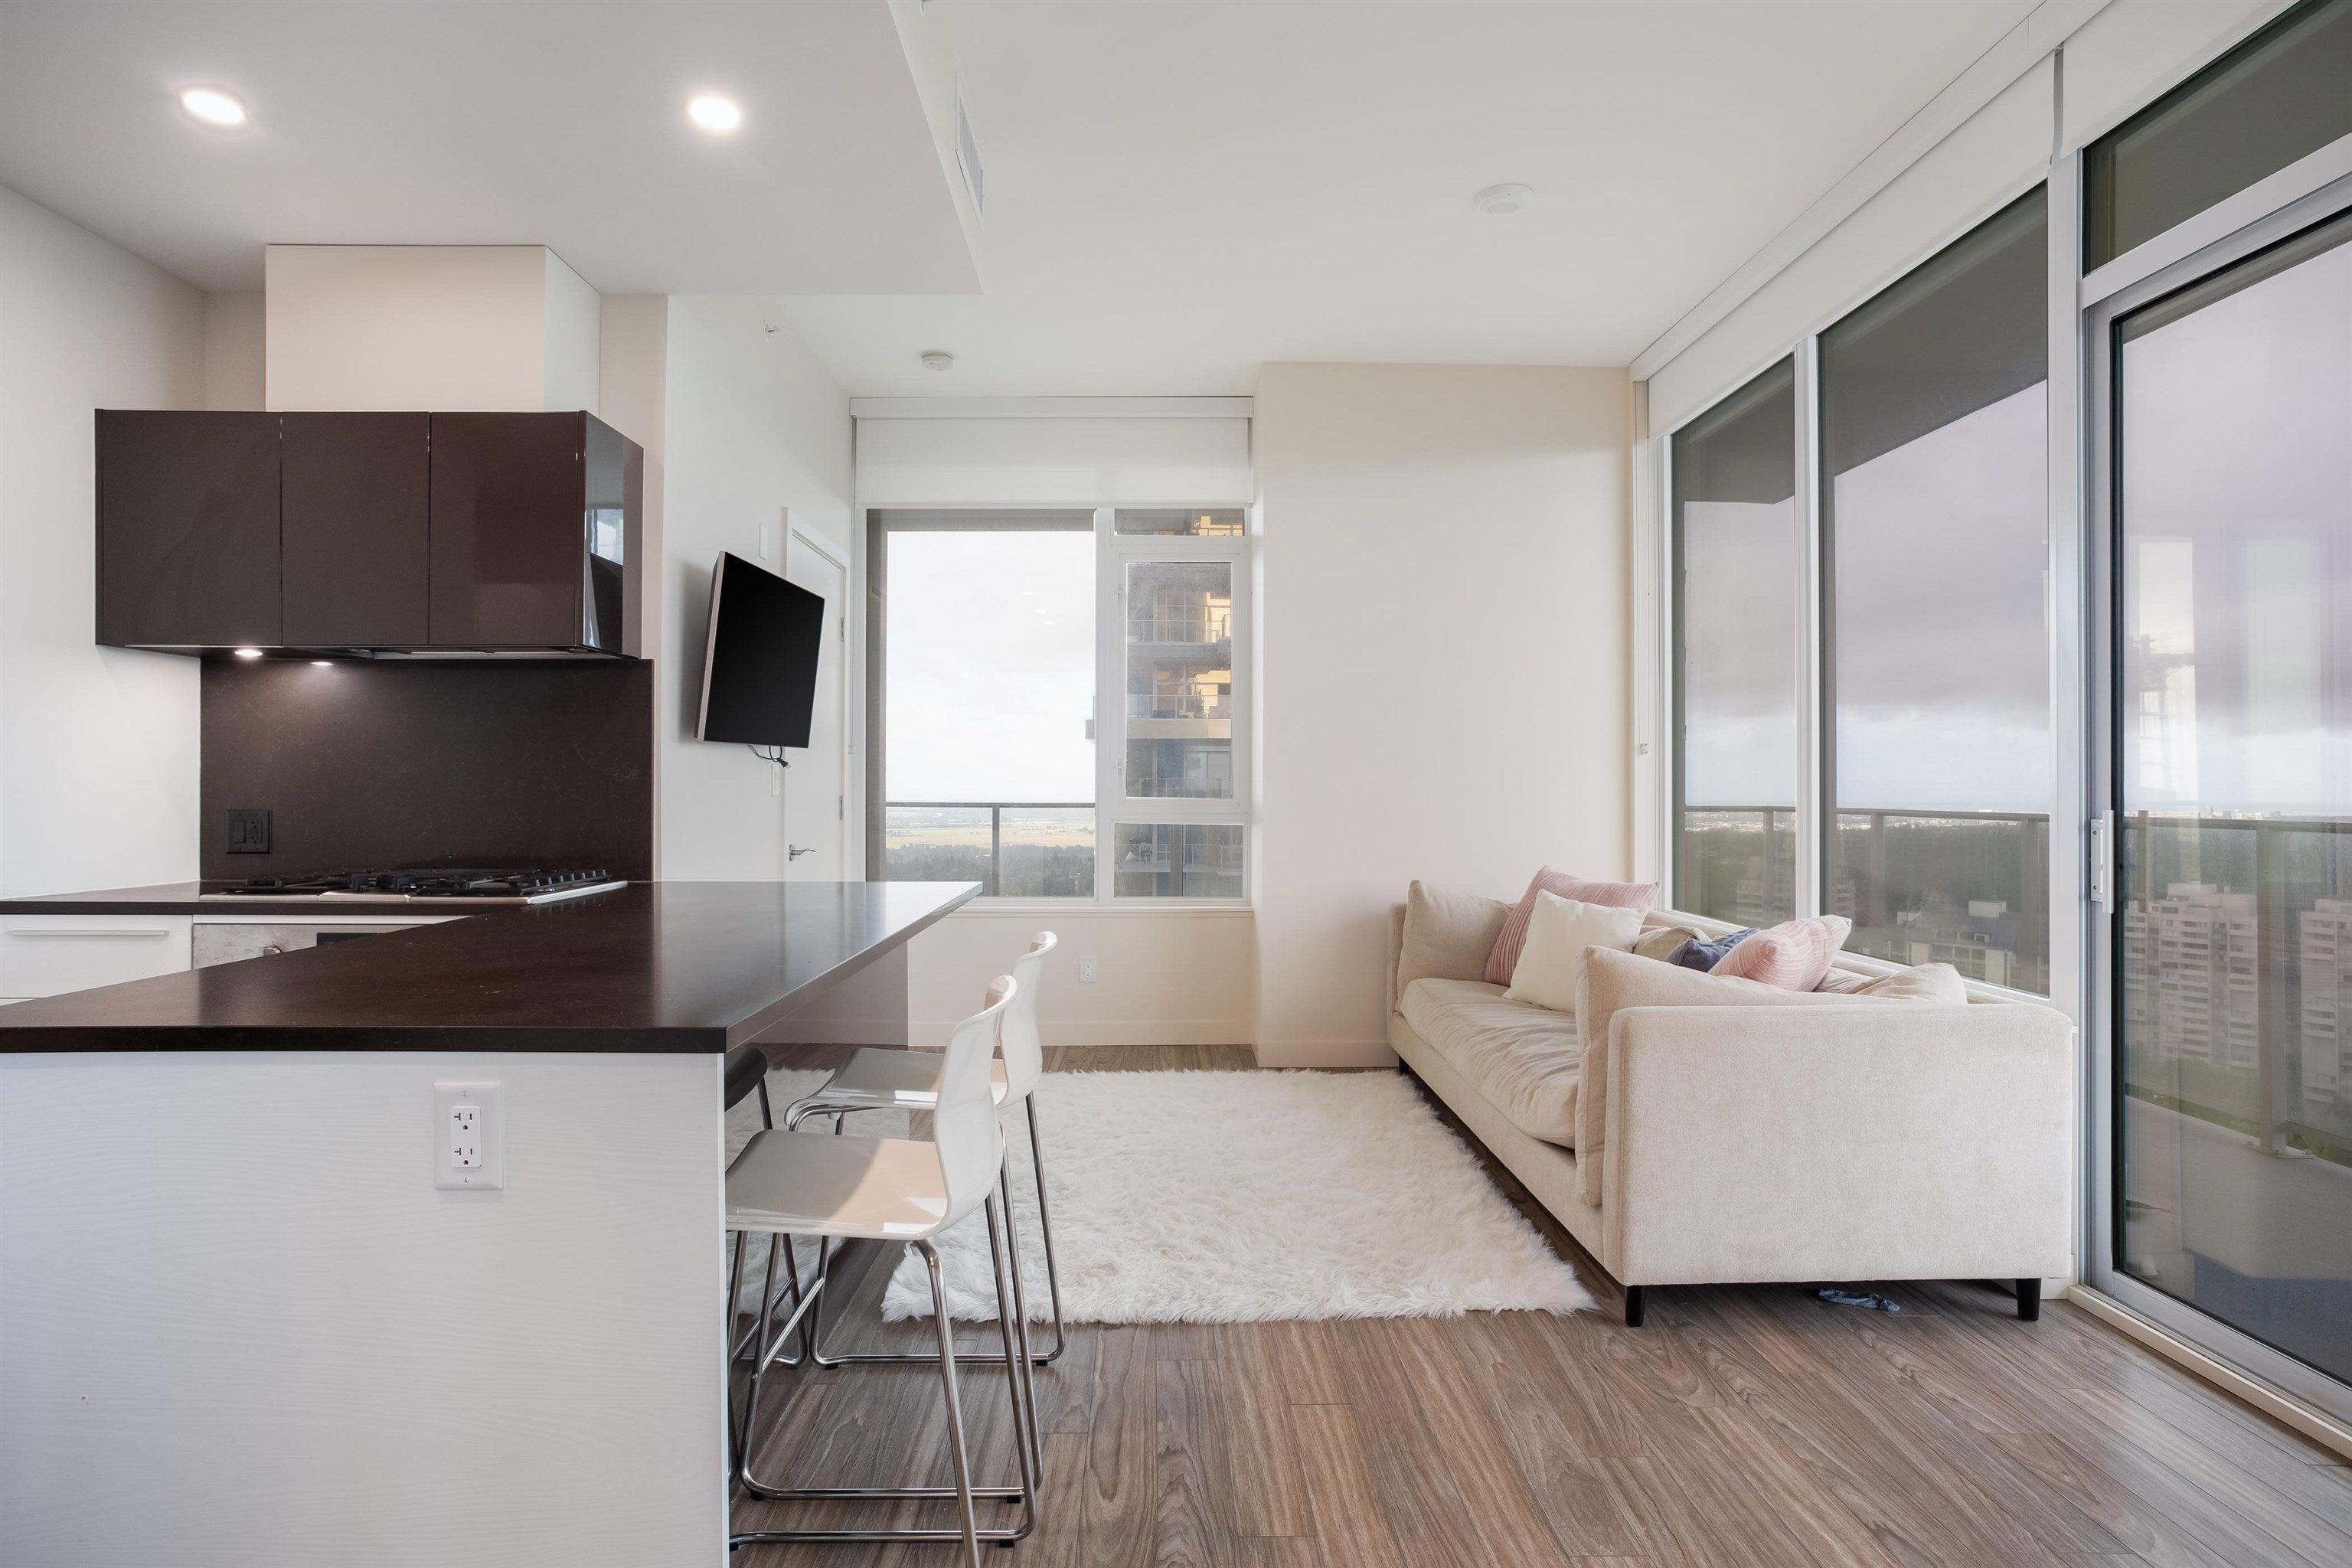 2206 6383 MCKAY AVENUE - Metrotown Apartment/Condo for sale, 2 Bedrooms (R2625647) - #9